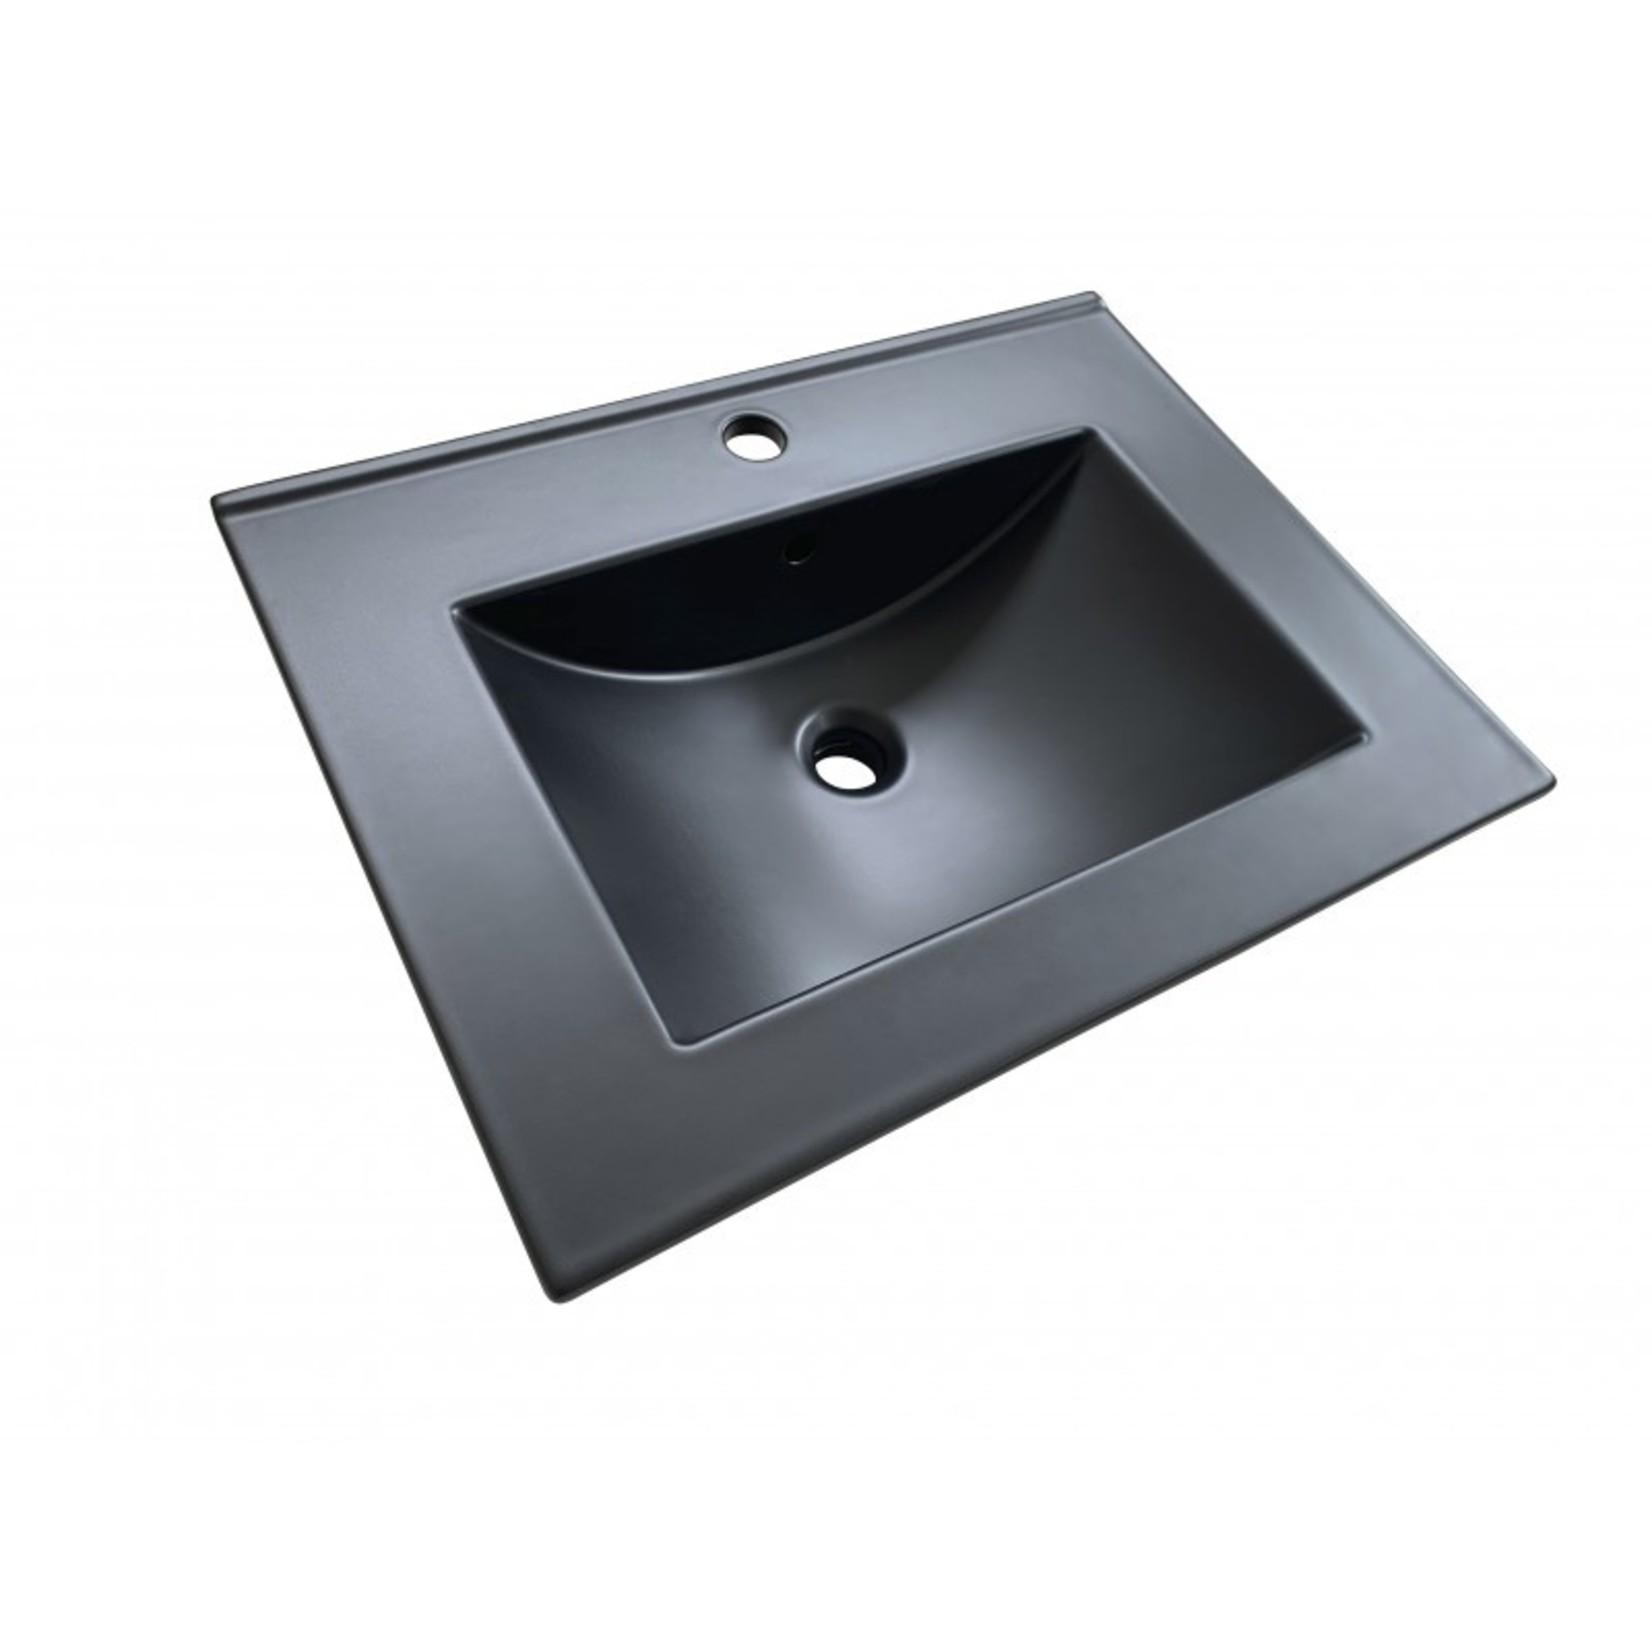 Black porcelain sink DI-2026